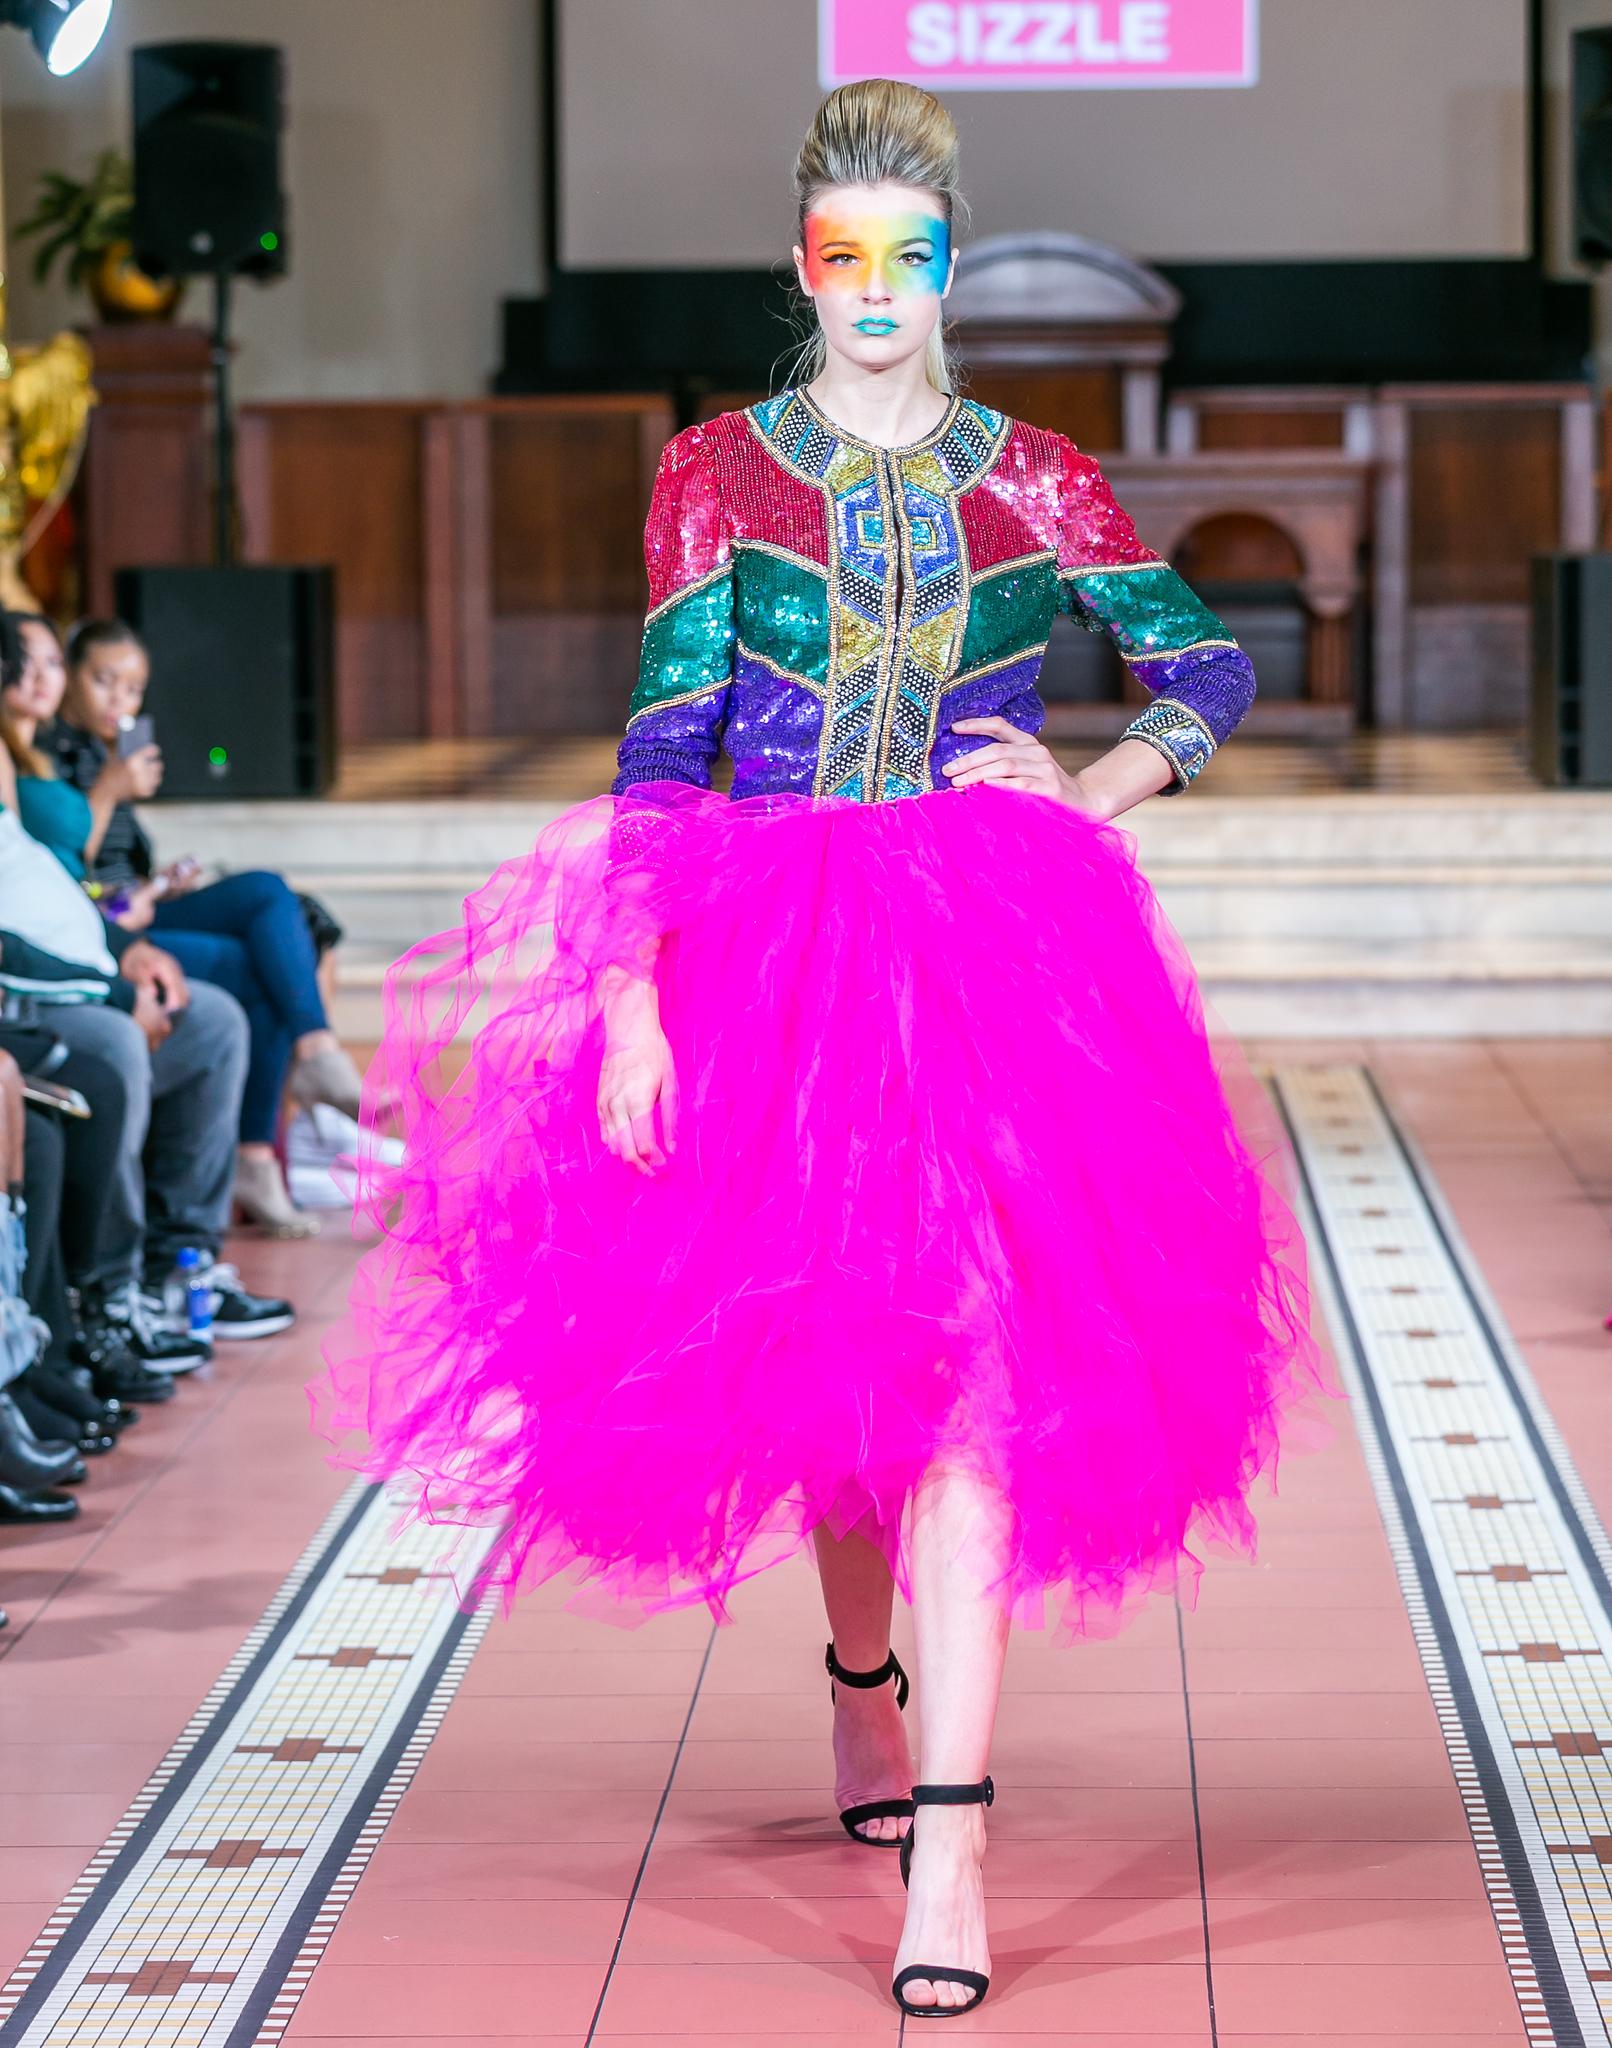 fashion-sizzle-boutique-beauty-fashion-week-2019